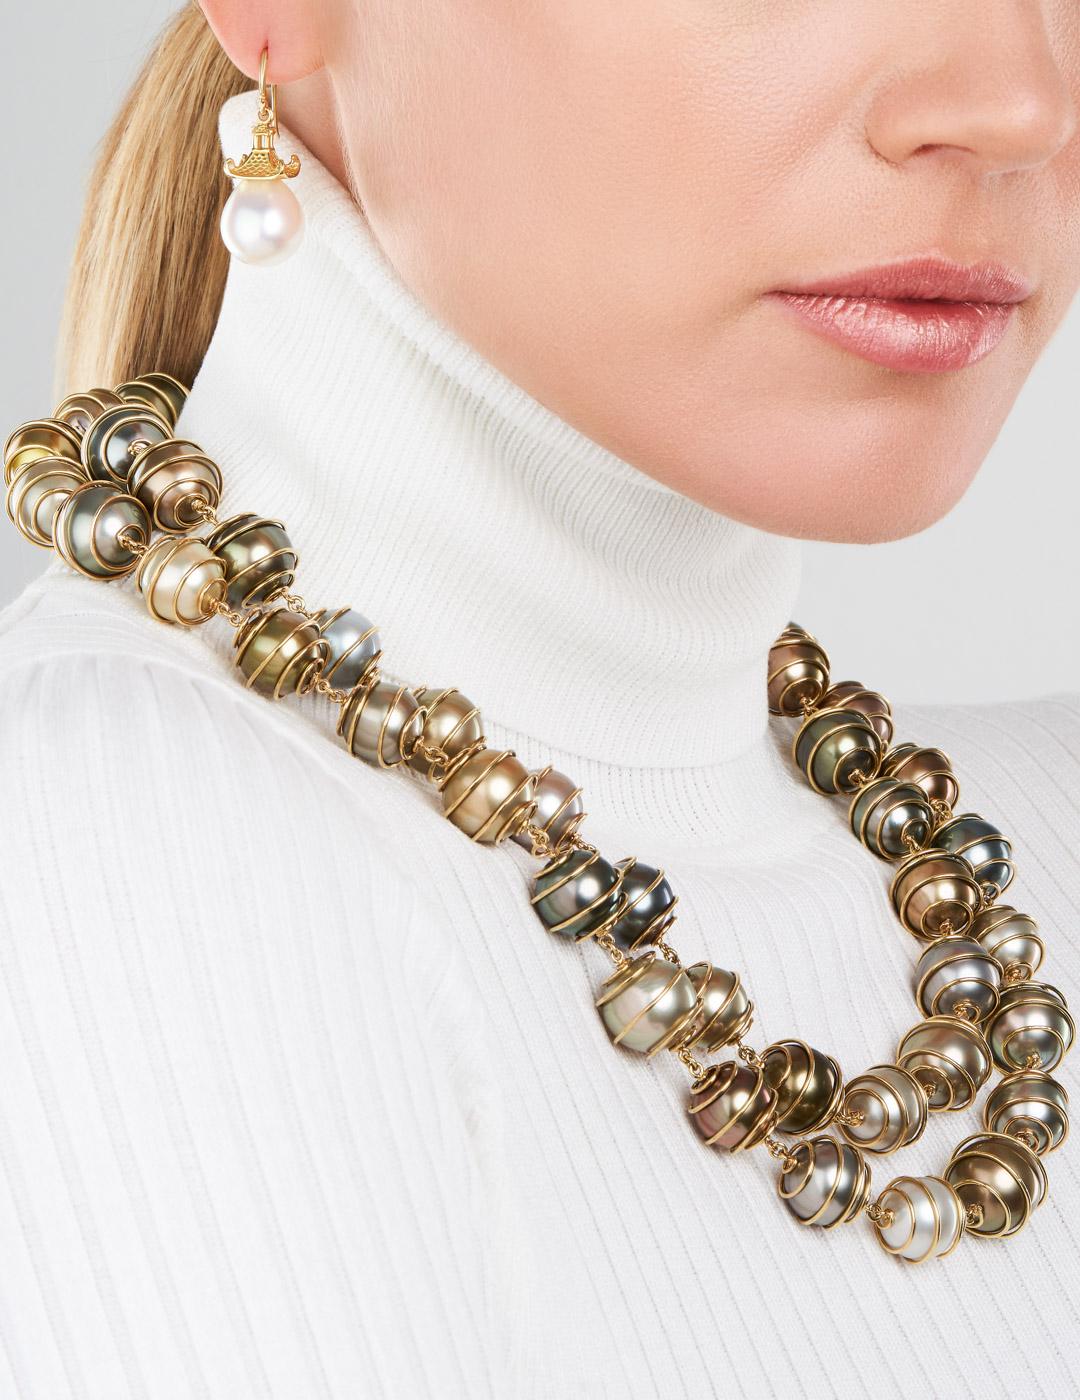 mish_necklaces_Orbiting-Prl-Tah-NK-4